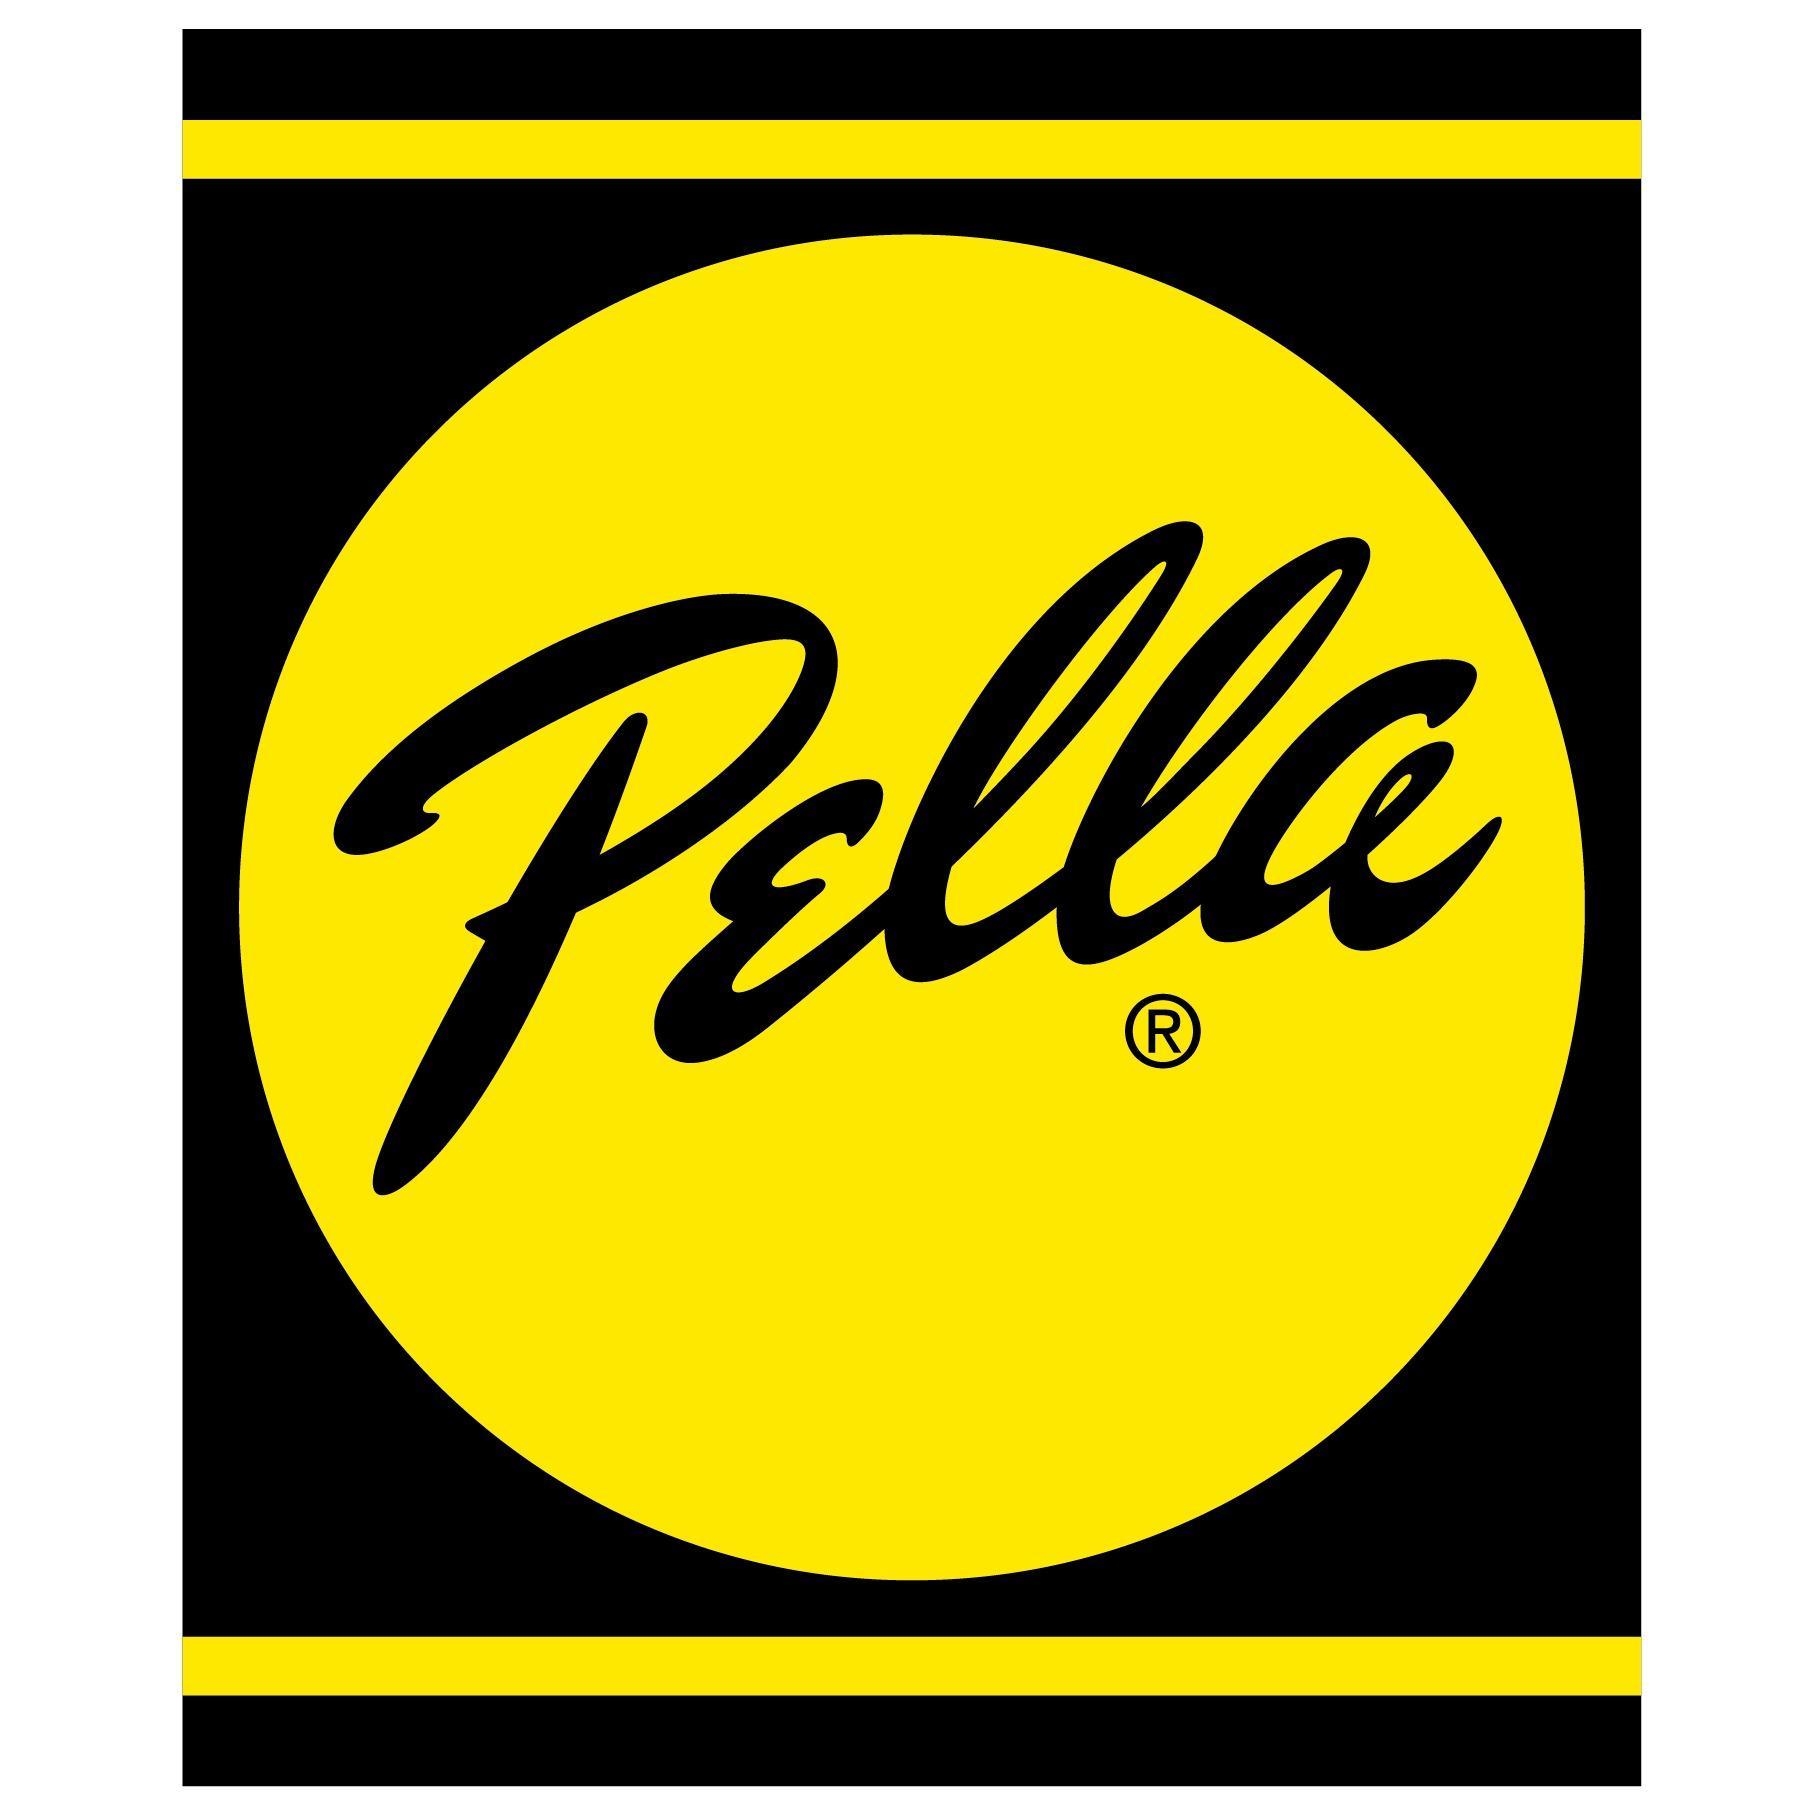 Pella Windows and Doors of Newport